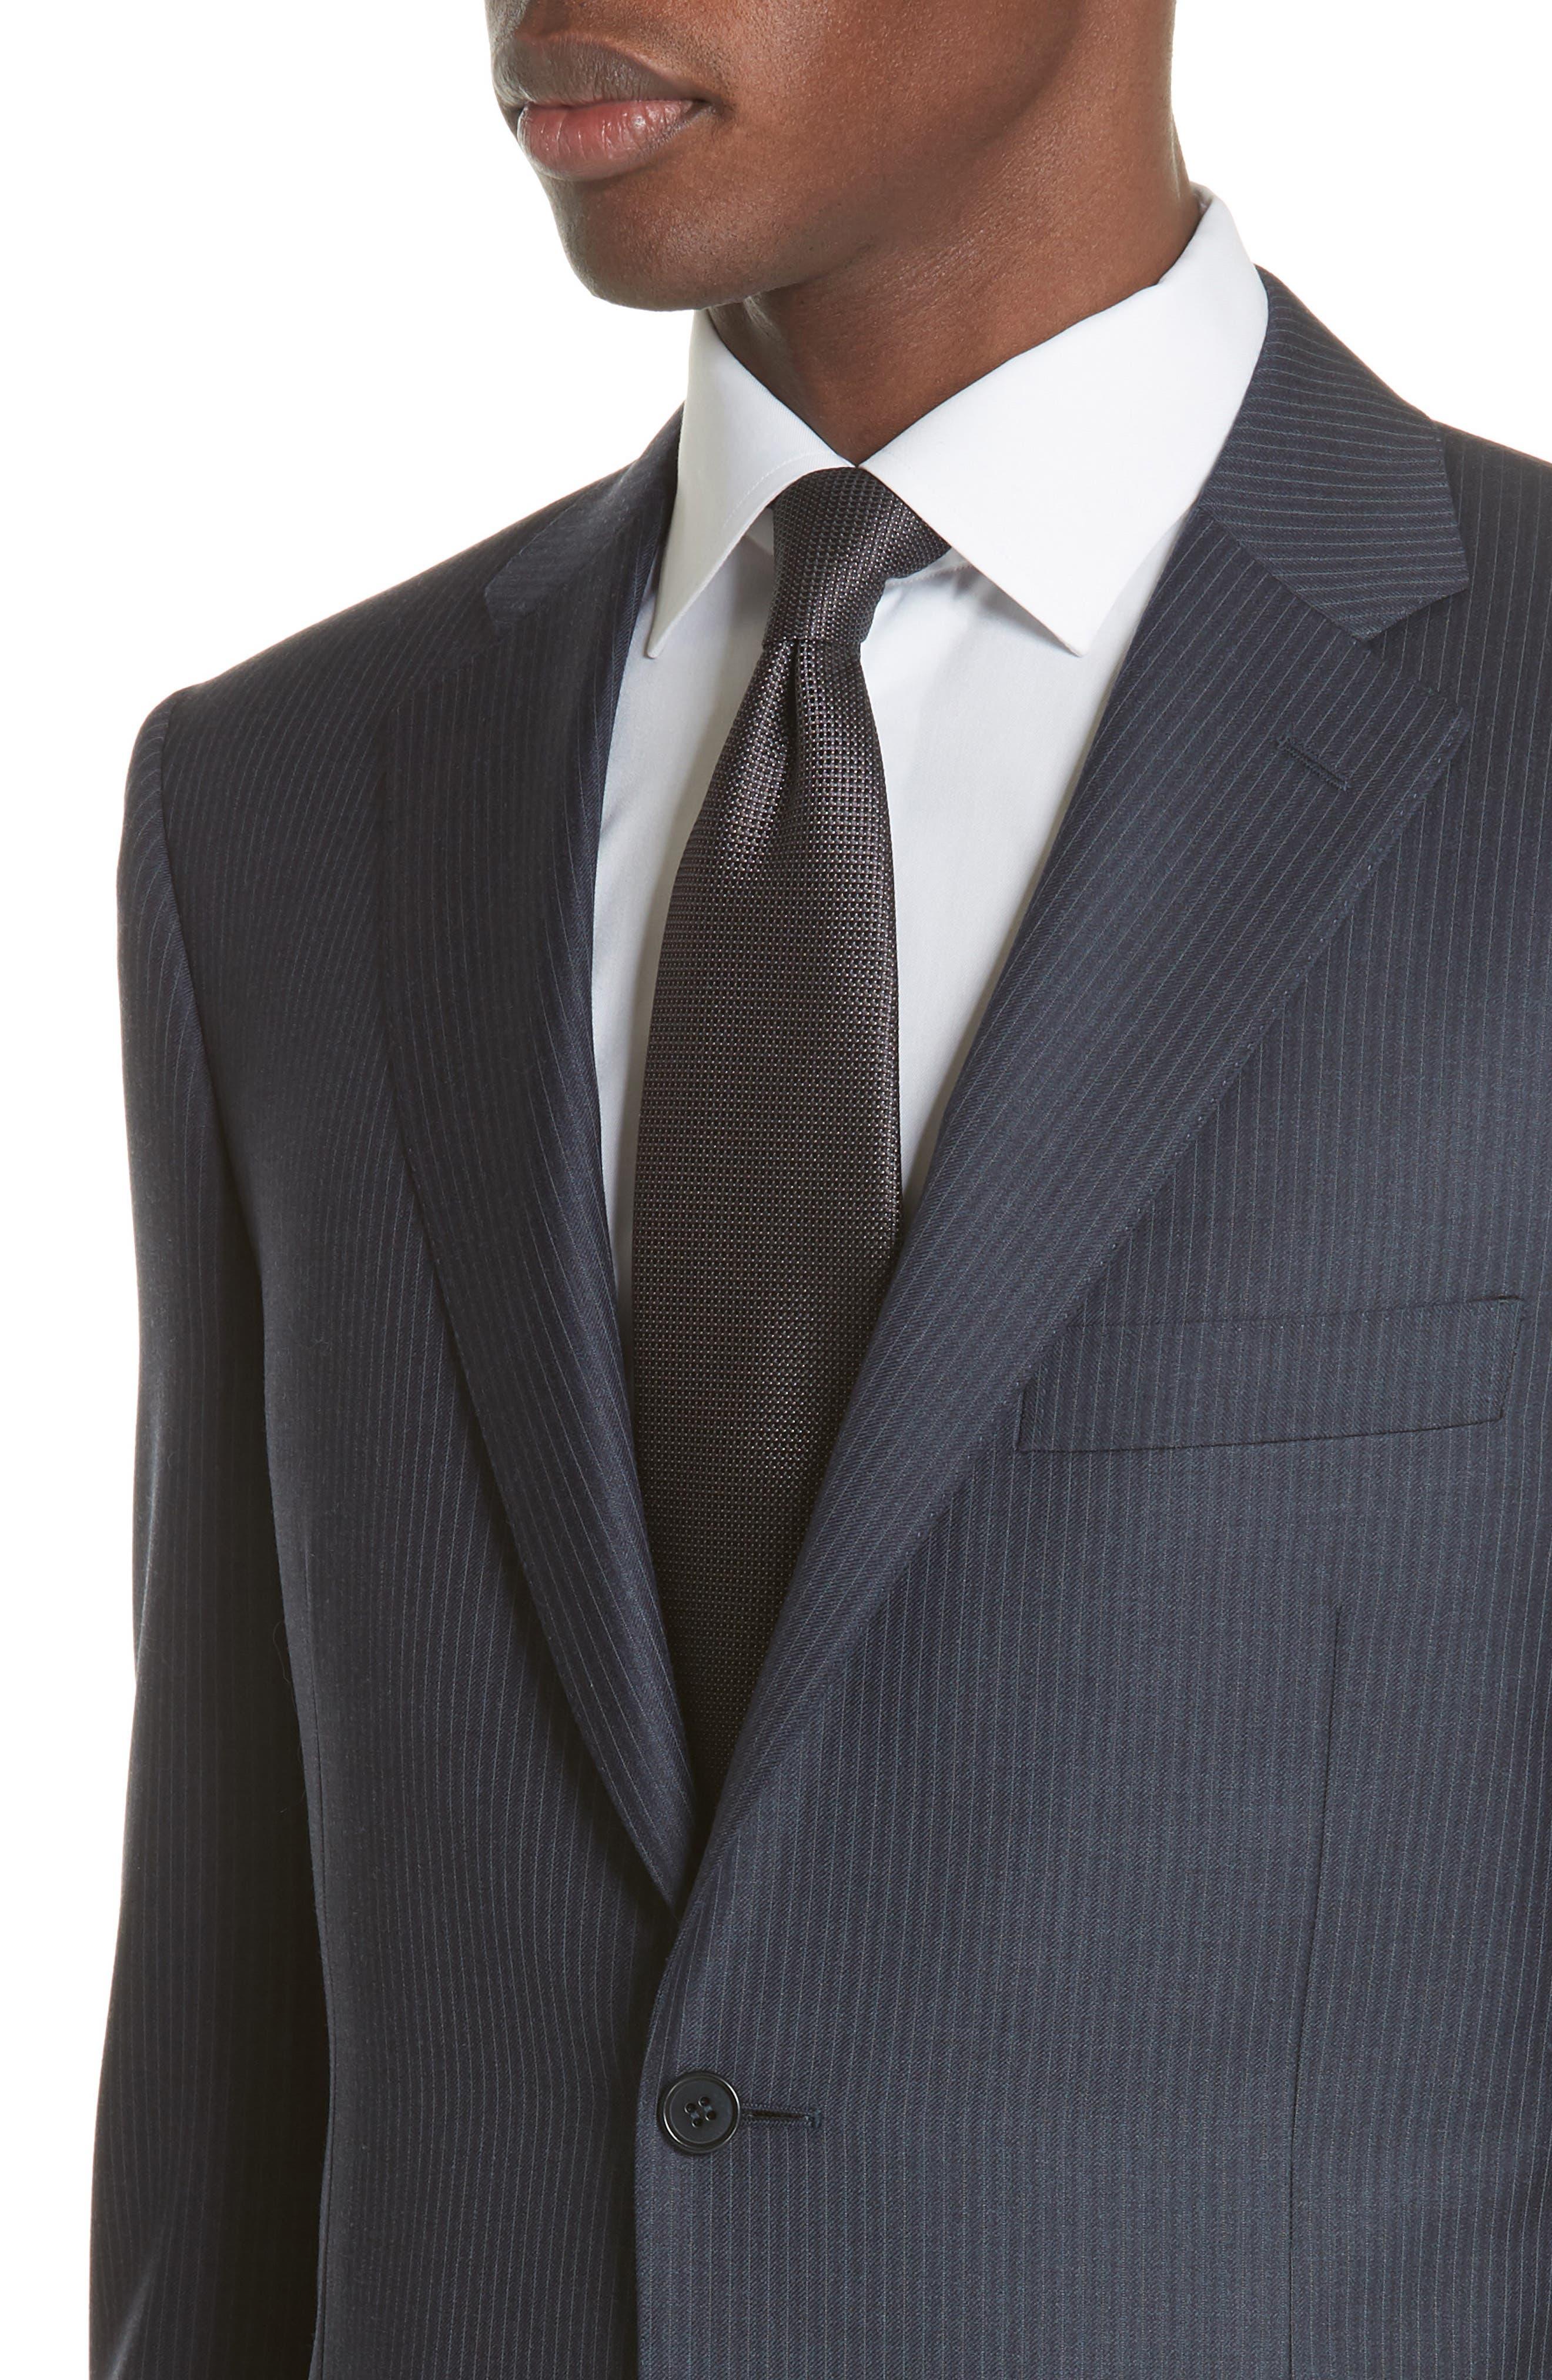 Classic Fit Pinstripe Wool Suit,                             Alternate thumbnail 4, color,                             410